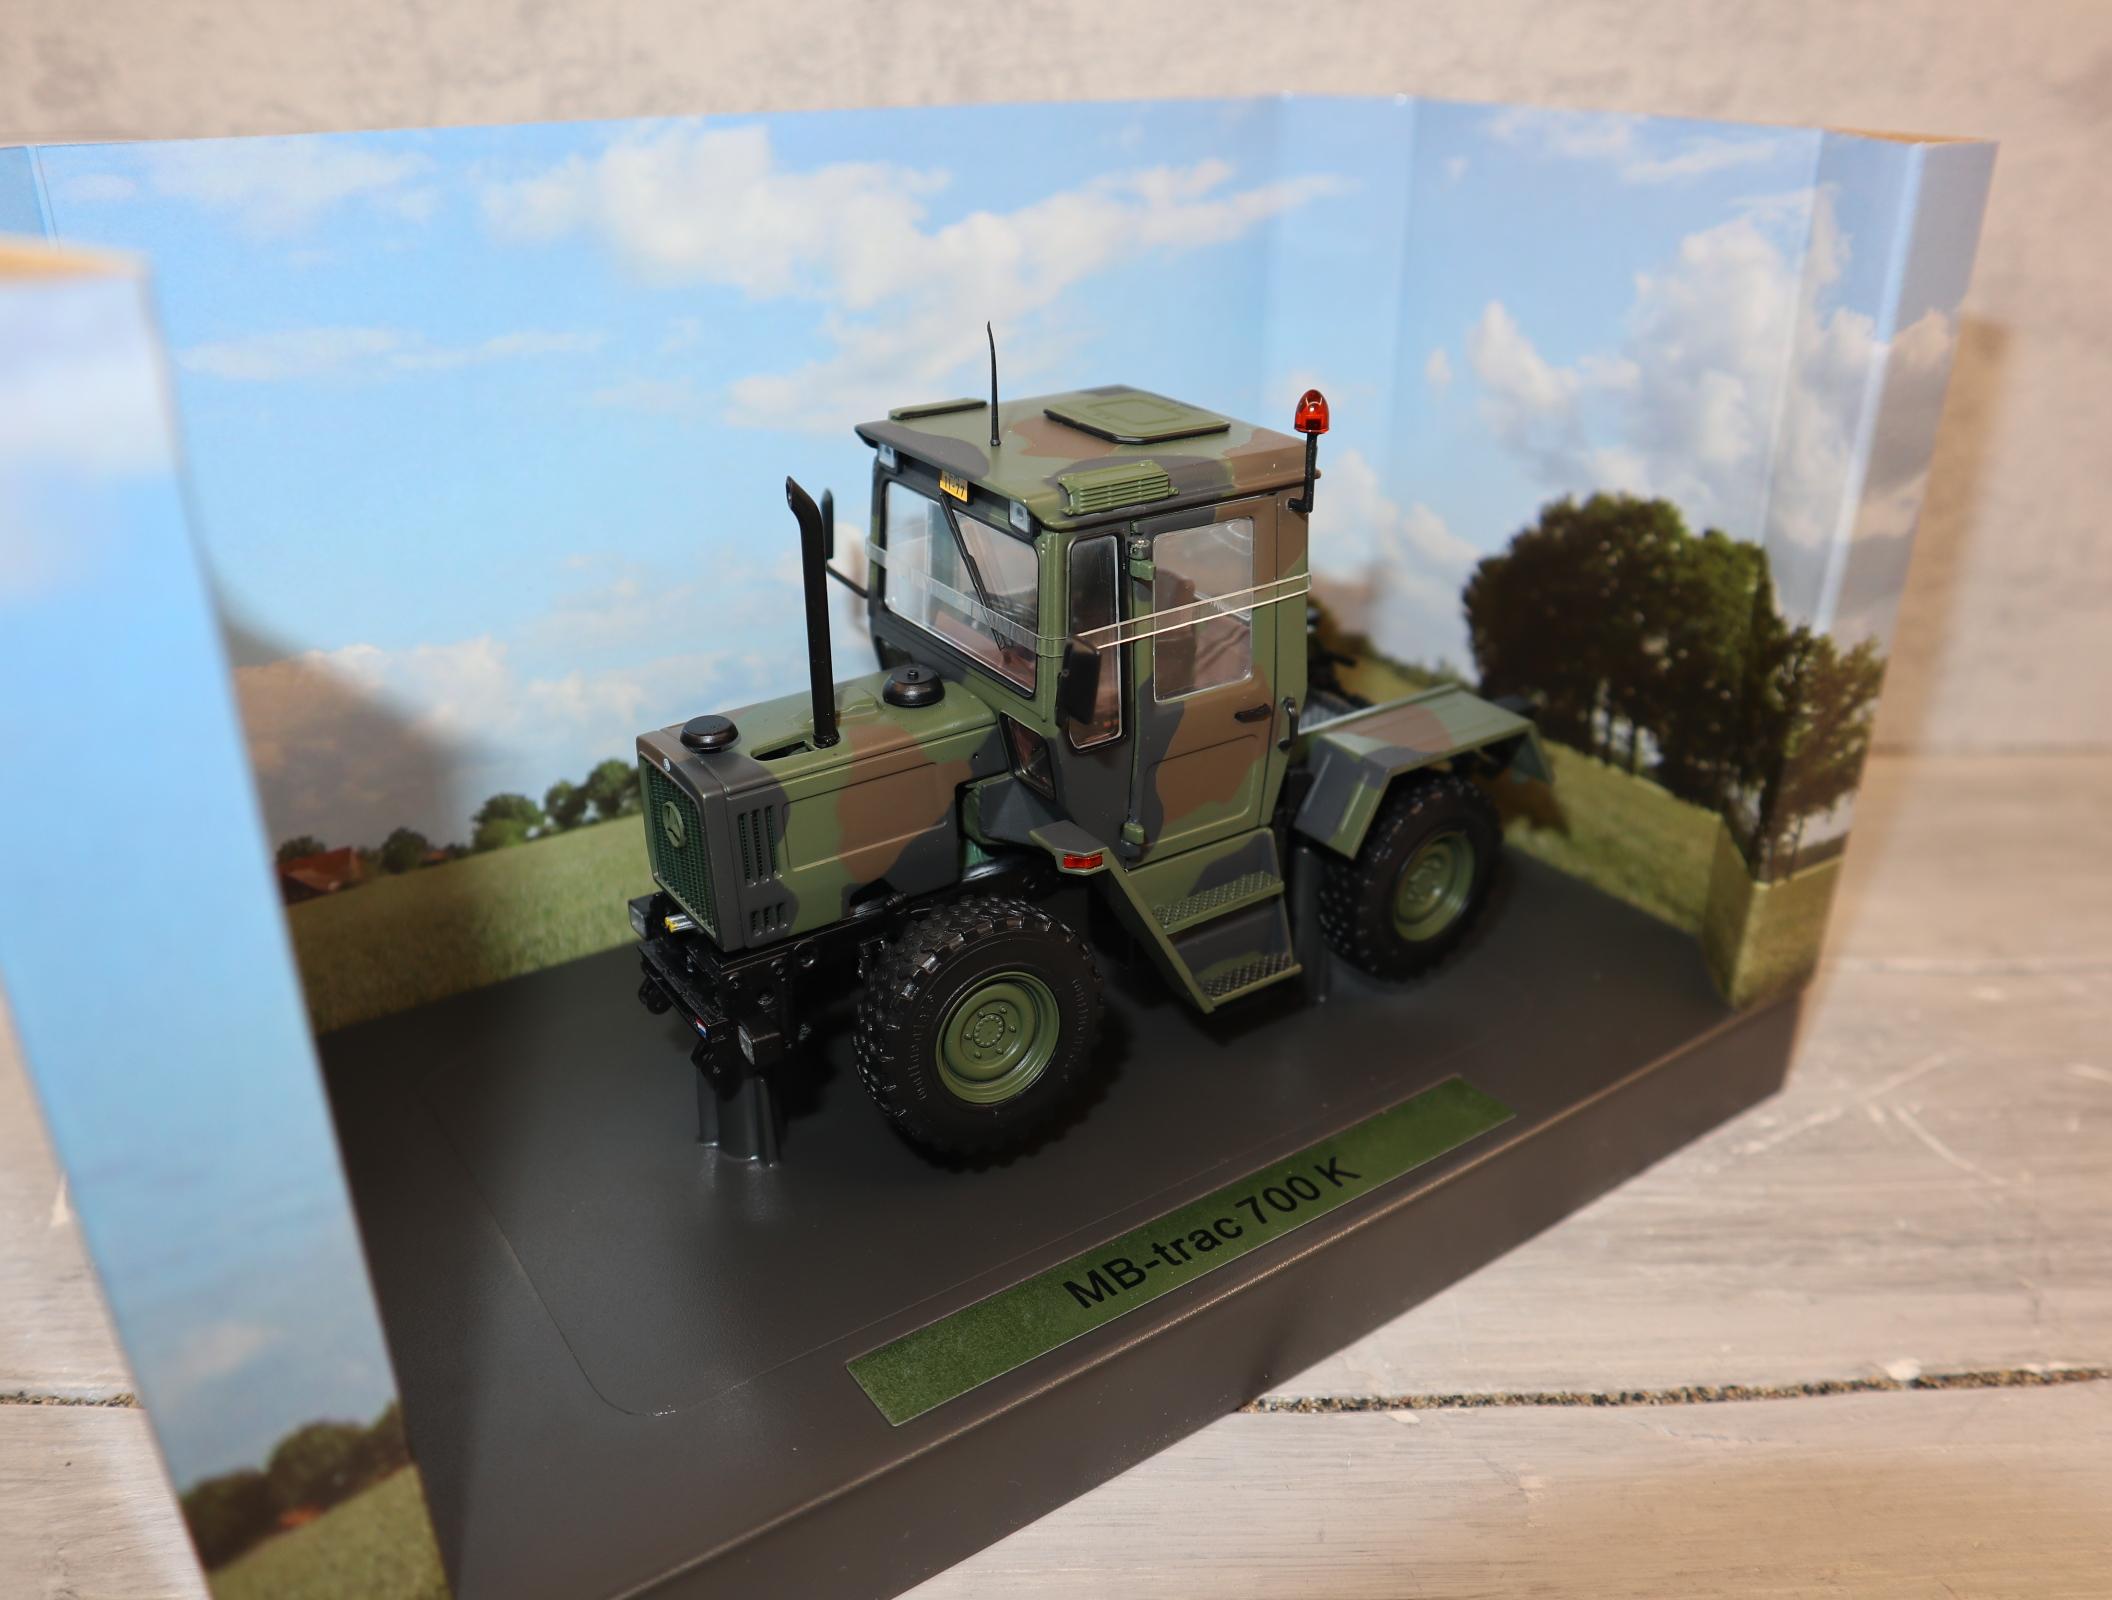 Weise Toys 2039 1:32 MB Trac 700 NL-Army Flecktarn